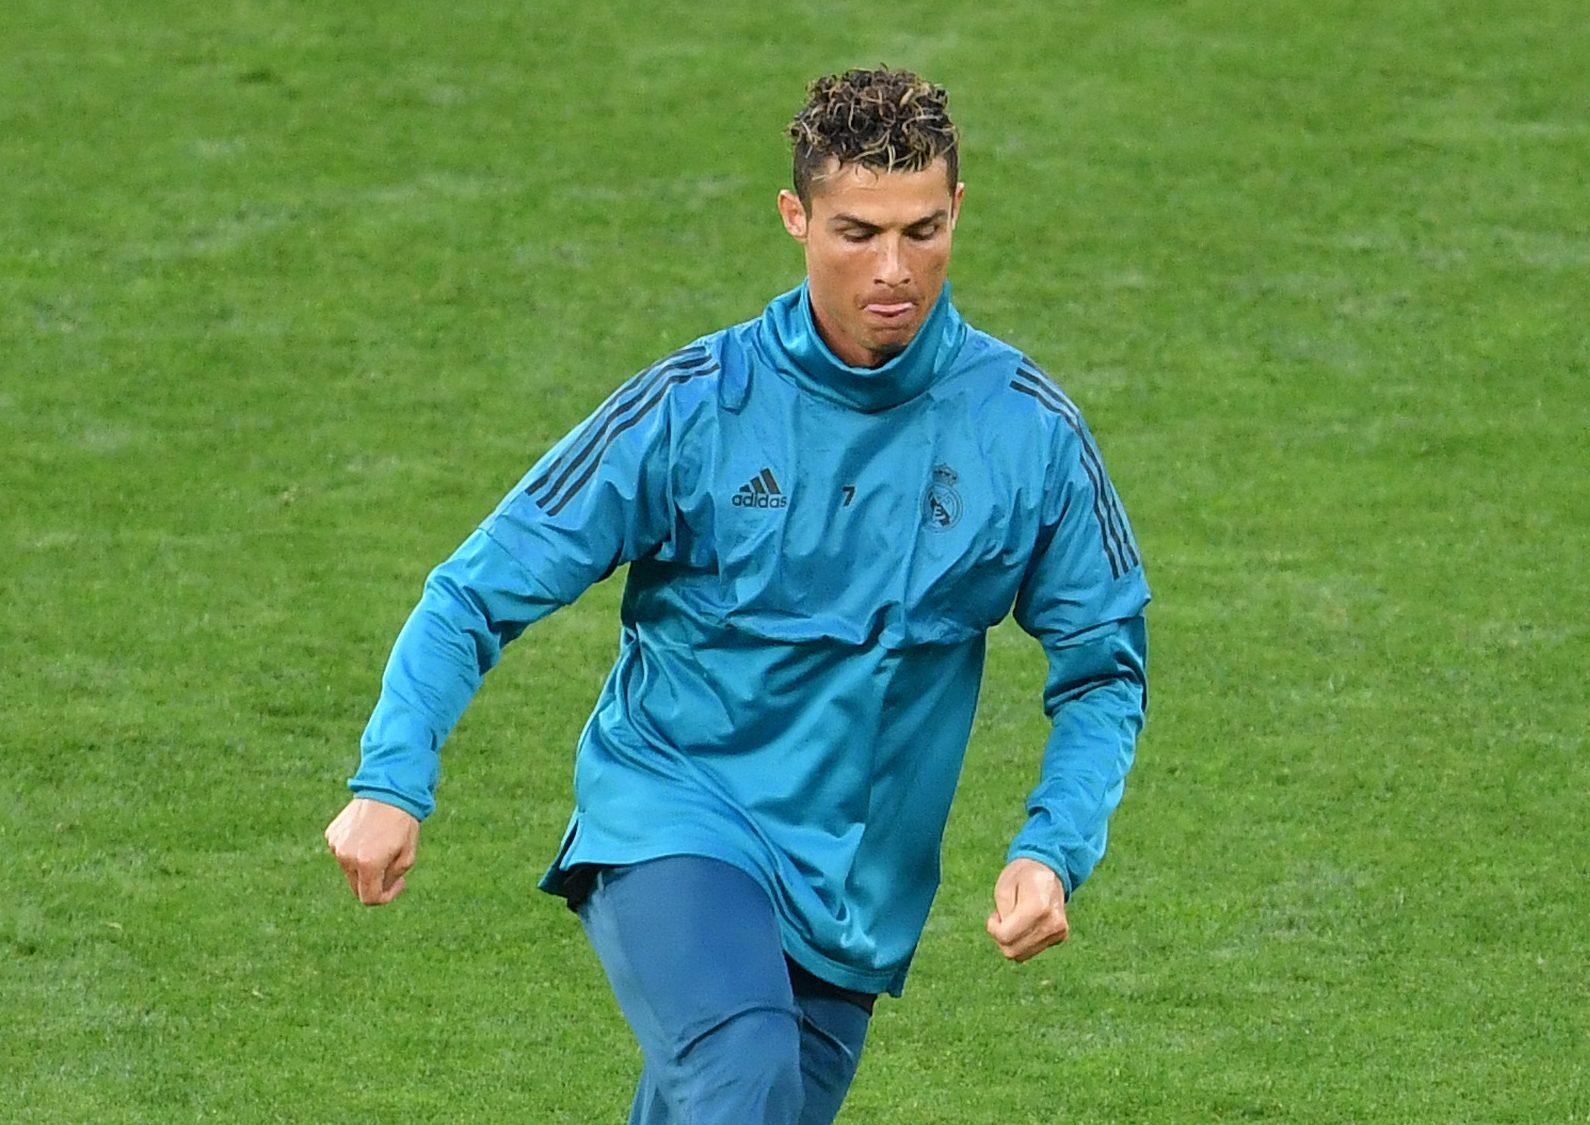 Cristiano Ronaldo Balonazo Camarógrafo Champions League